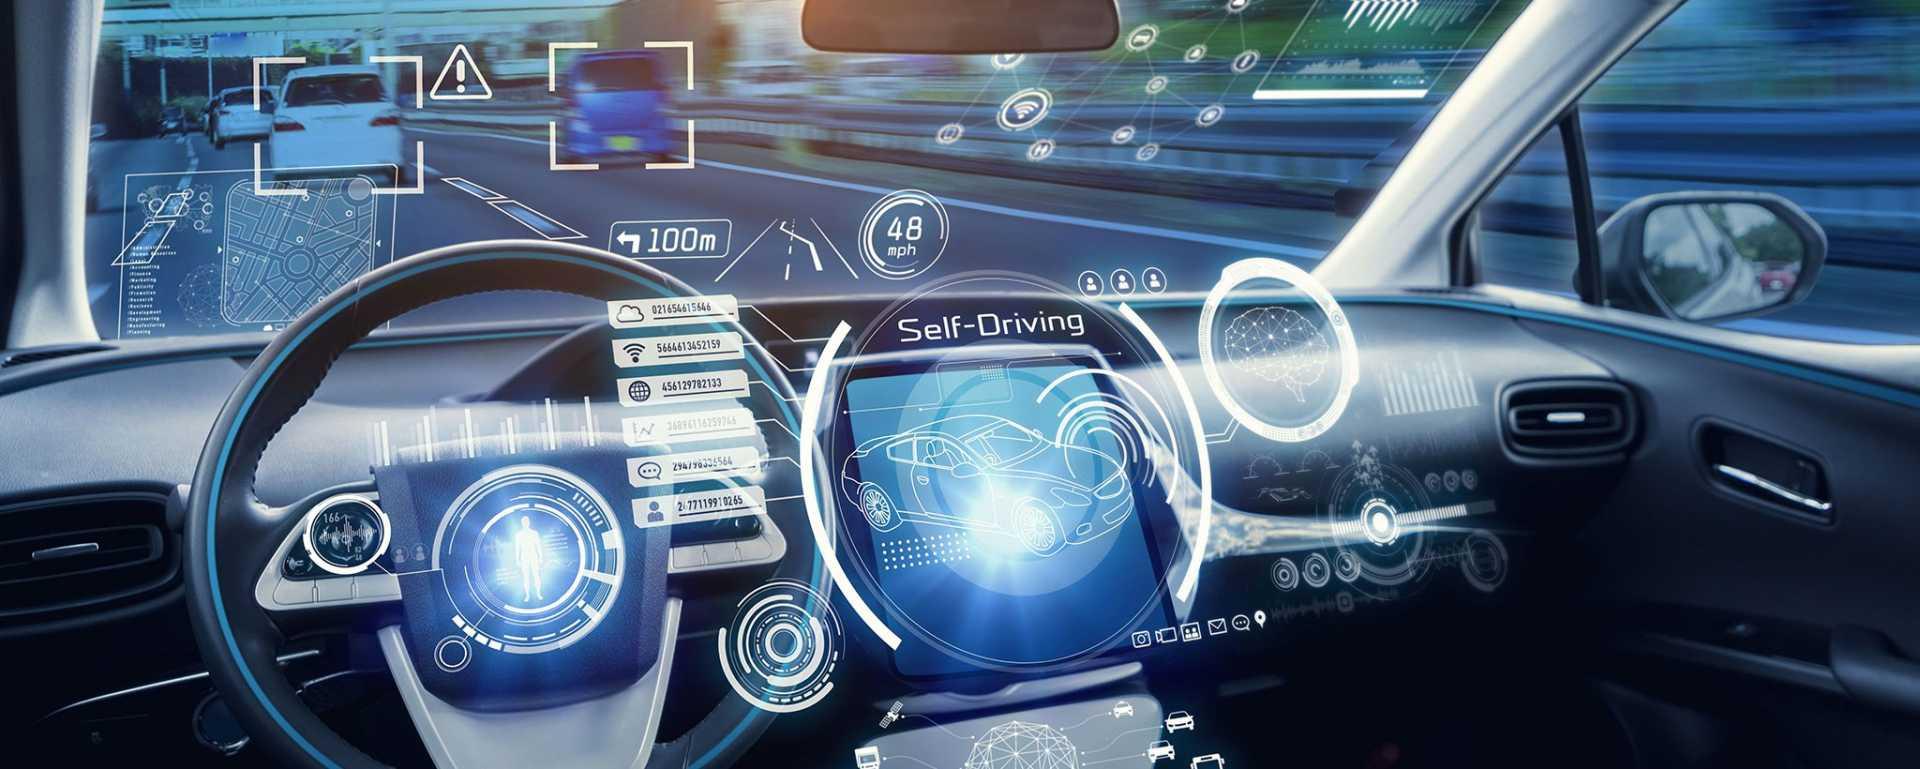 Capgemini - Hero Image - Future of Automotive Mobility